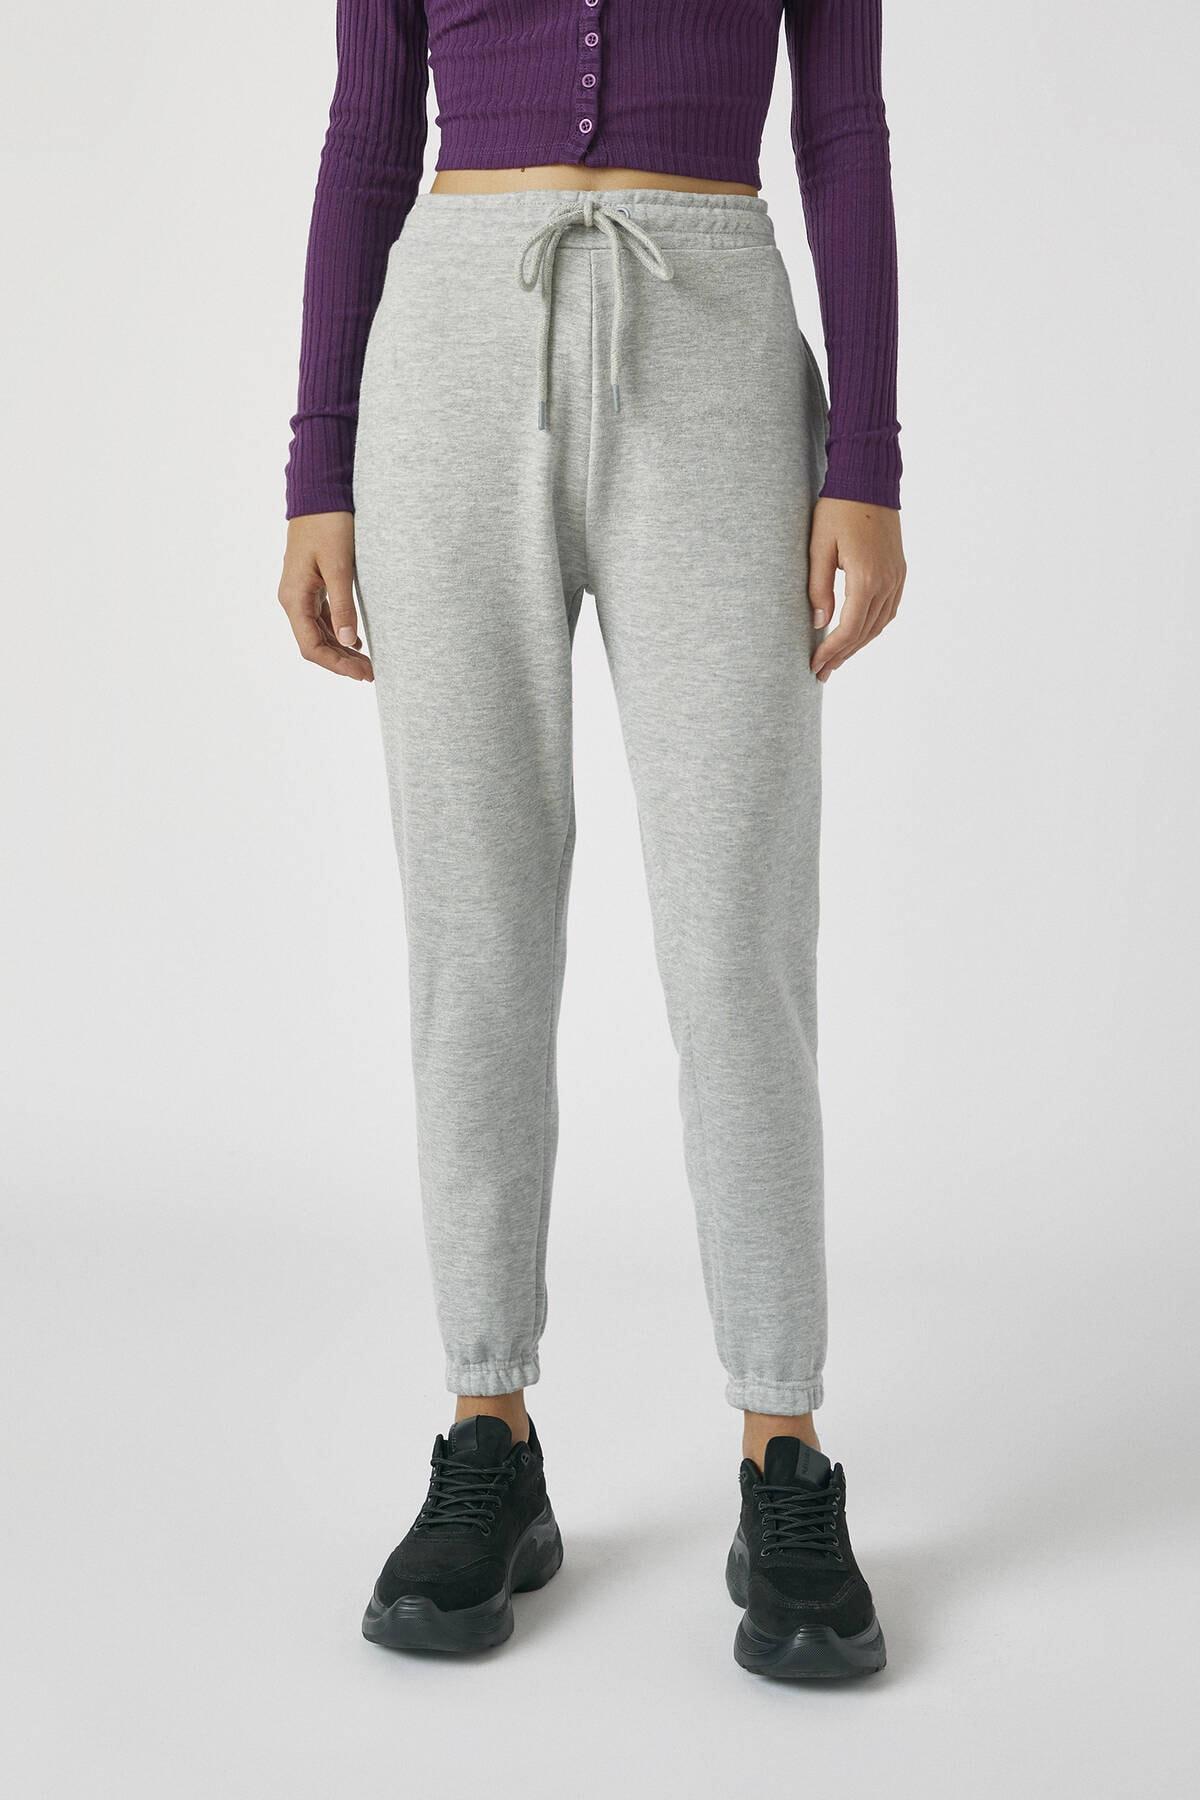 Pull & Bear Kadın Melanj Gri Elastik Paçalı Basic Jogging Fit Pantolon 05670324 2